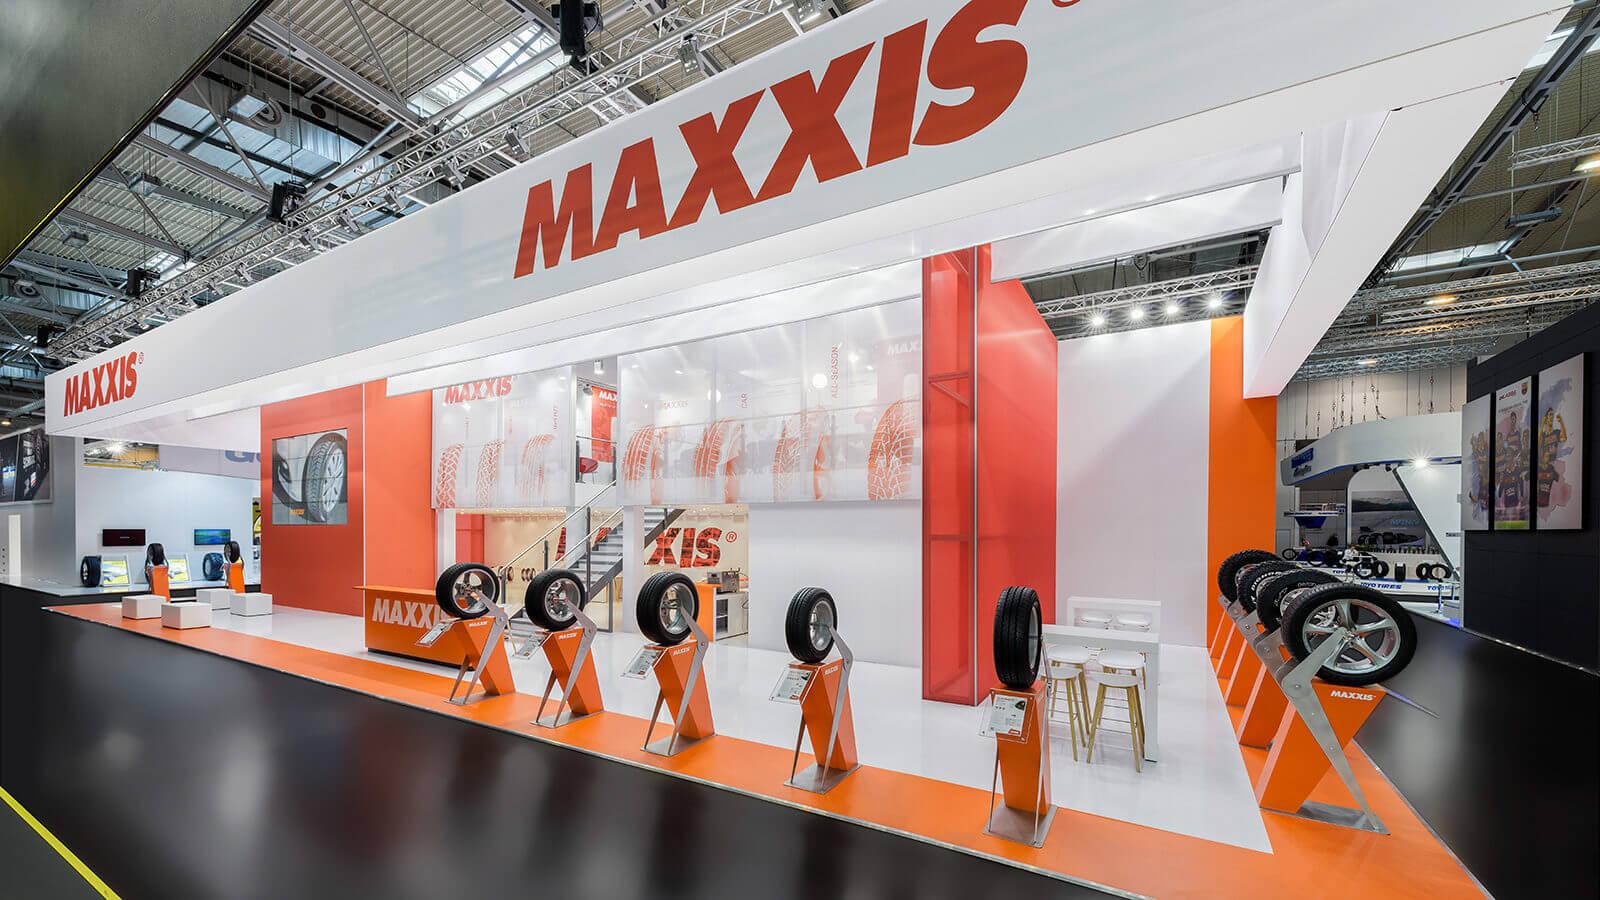 MAXXIS<br>270 m²<br>REIFEN